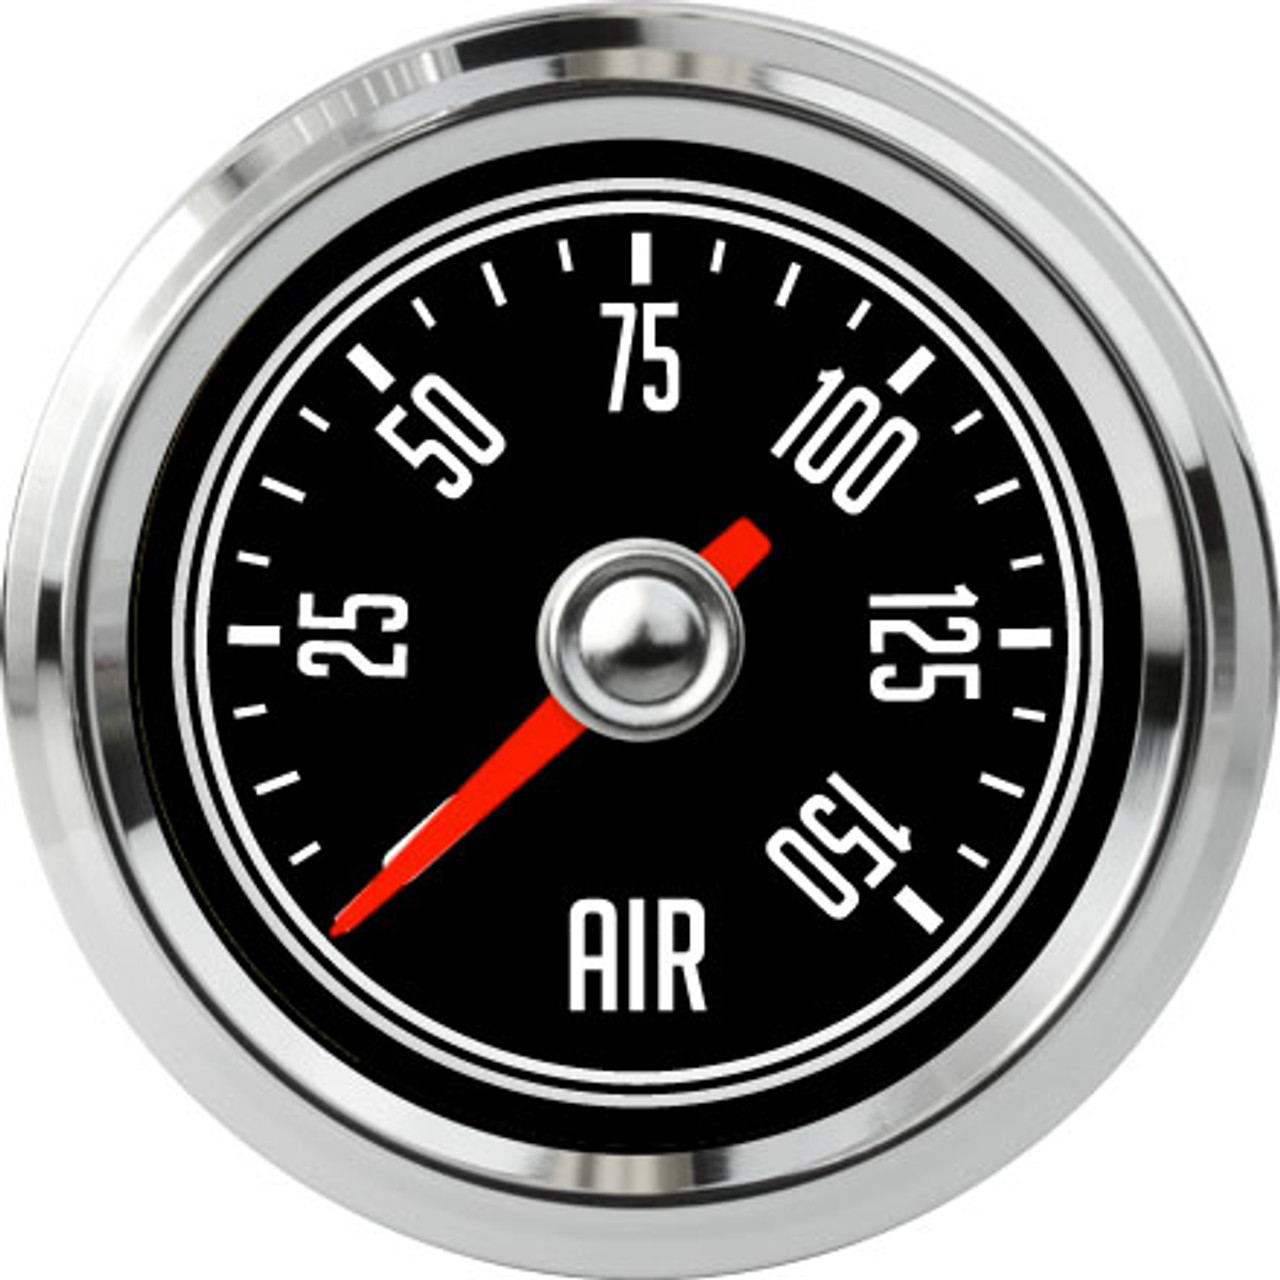 "2-1/16"" CJ Jeep Air Pressure Gauge 0-150 psi"